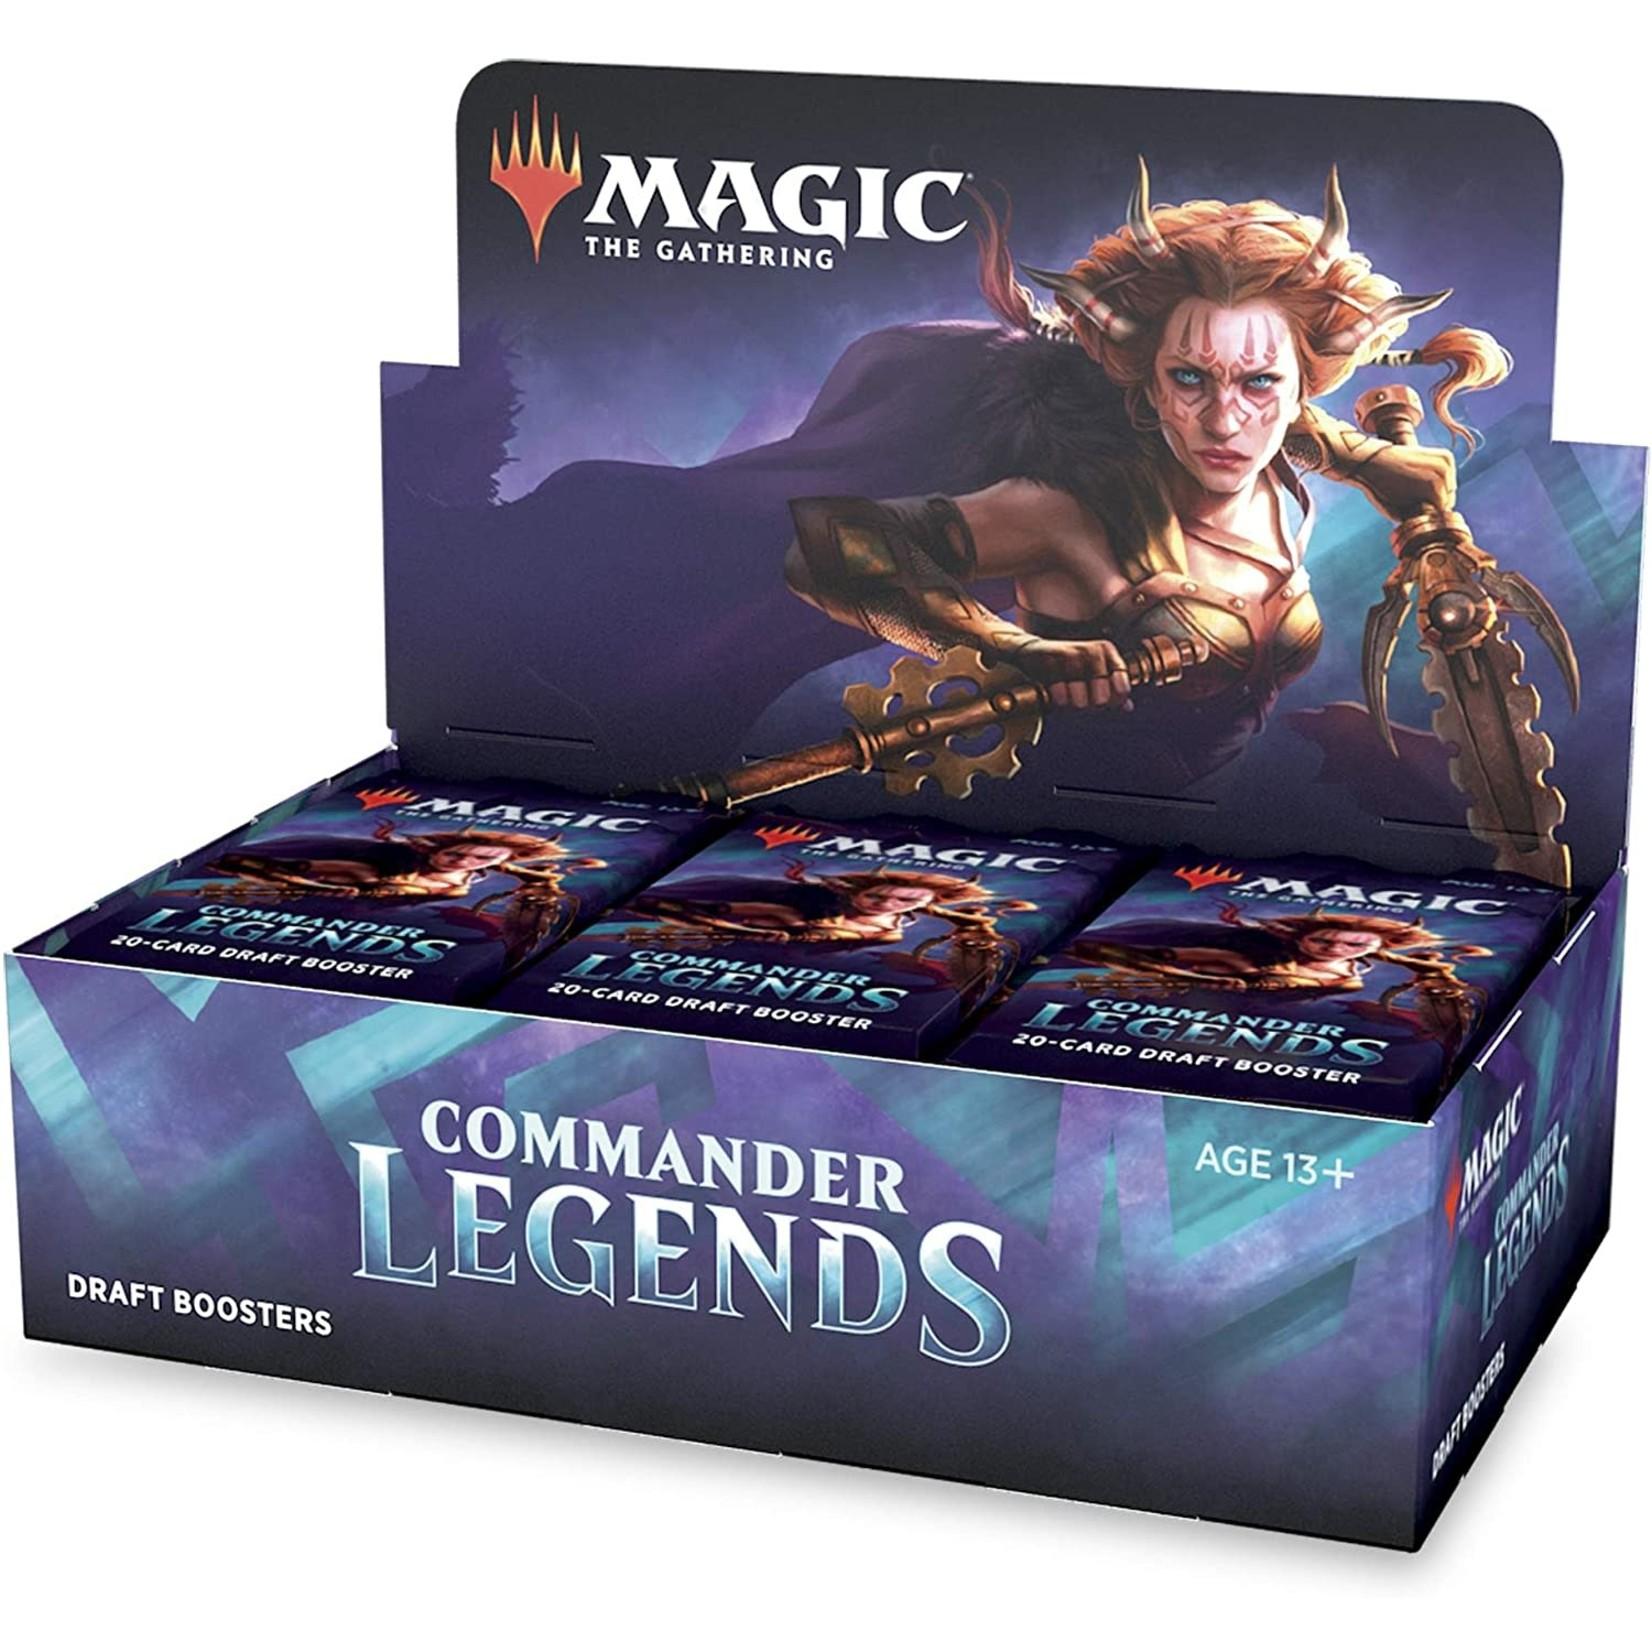 Magic: The Gathering Magic: The Gathering - Commander Legends Draft Booster Box (MTG CMR)